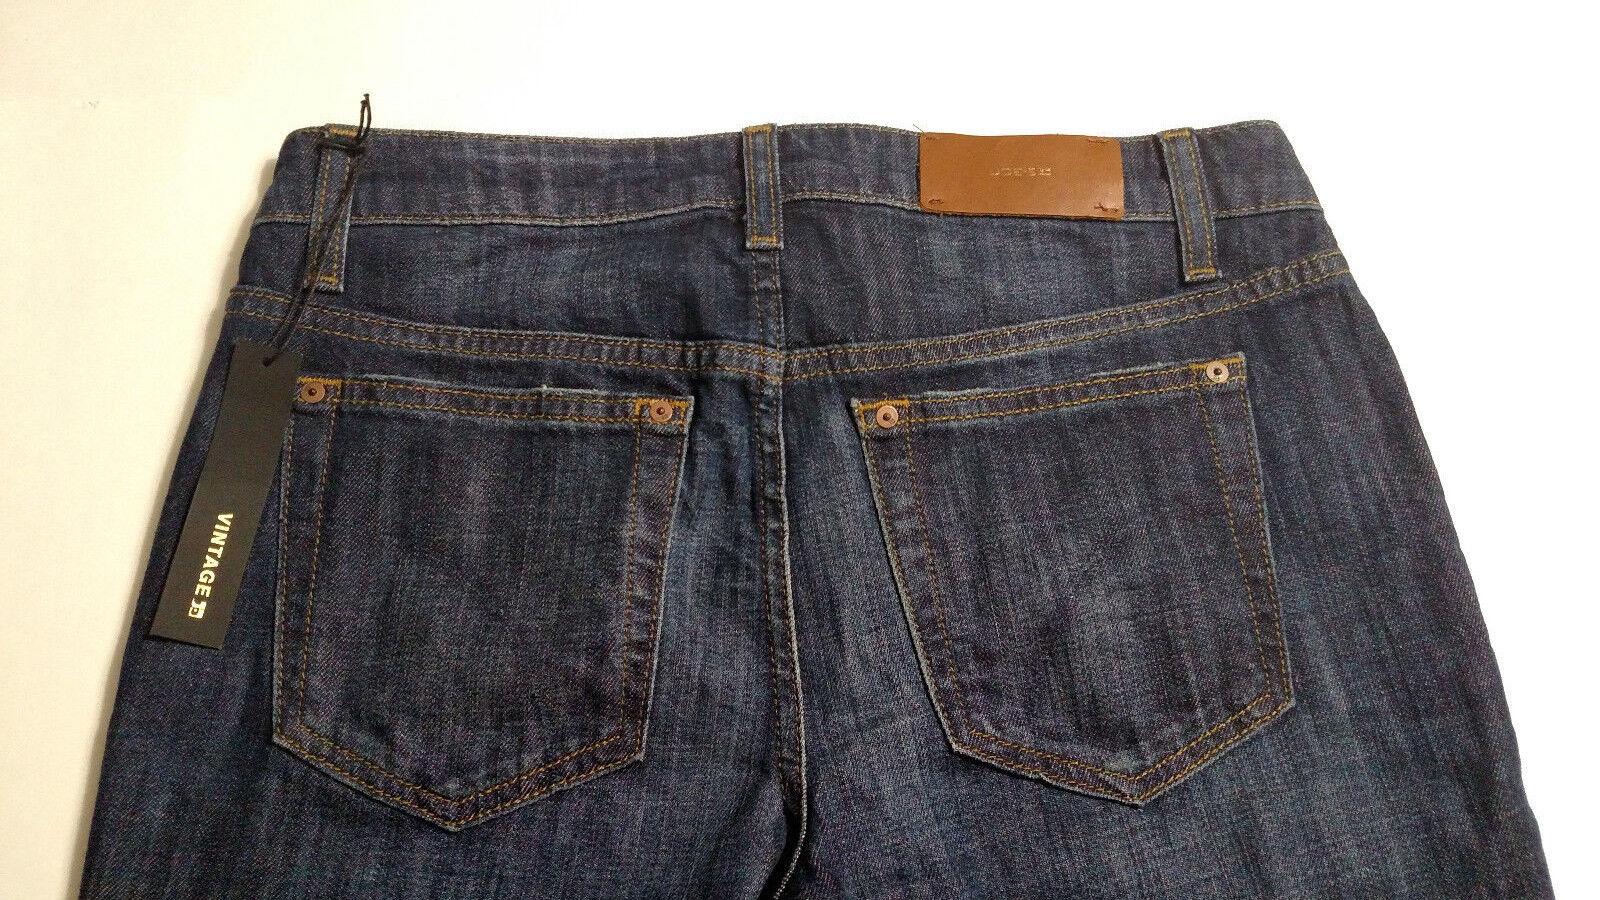 NWT Joe's Jeans High Waist The Flare Visionaire Denim Jeans Sz 28 Vintage Flare